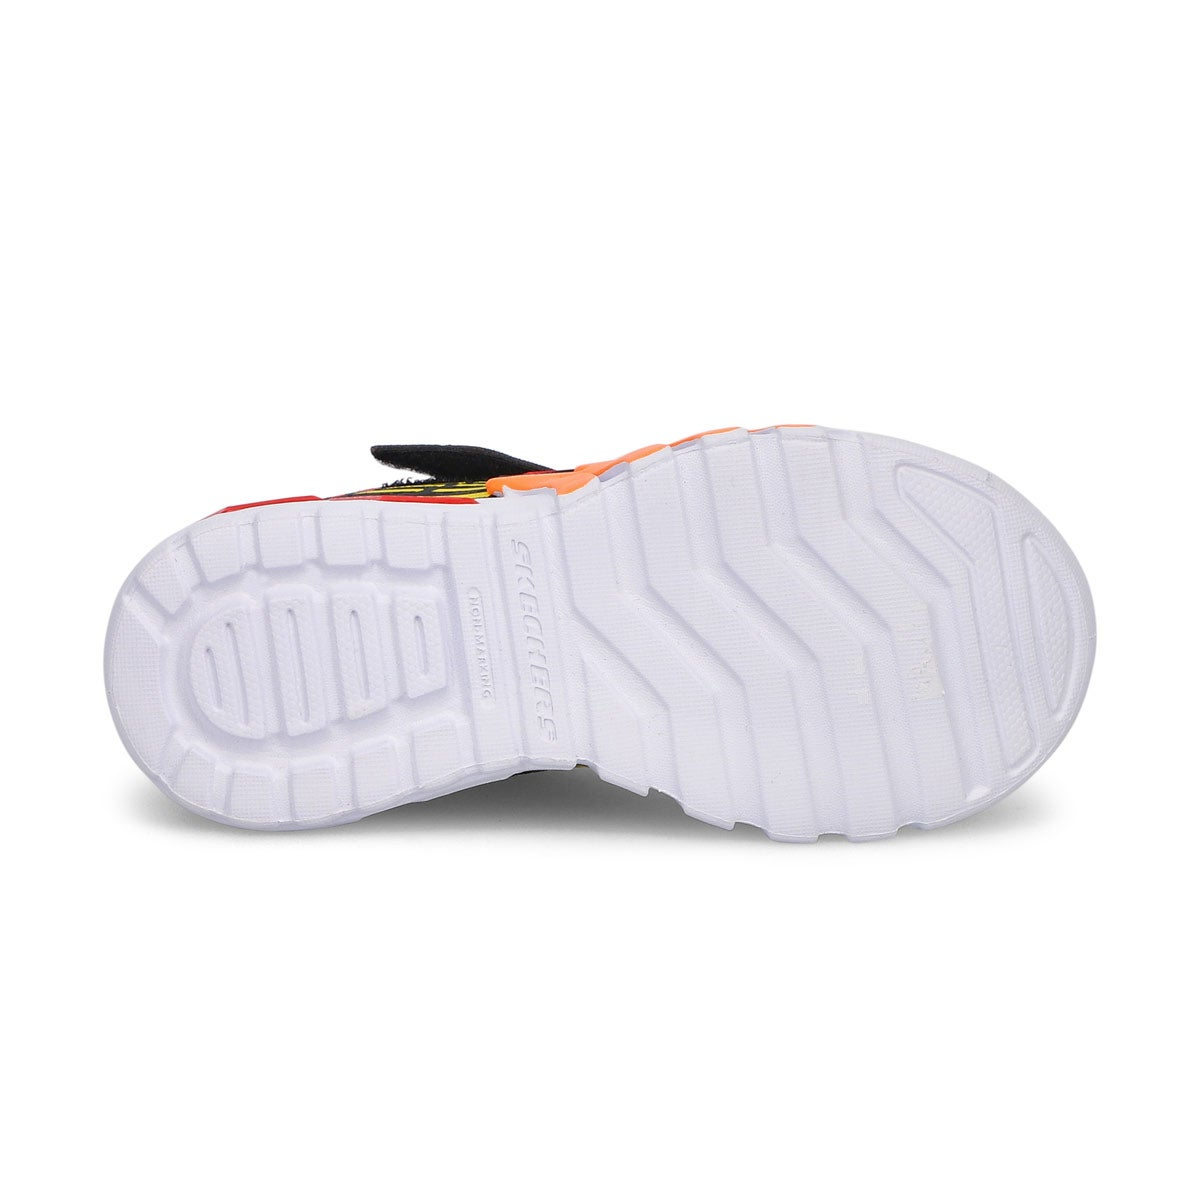 Boys' Flex-Glow Elite Light Up Sneakers